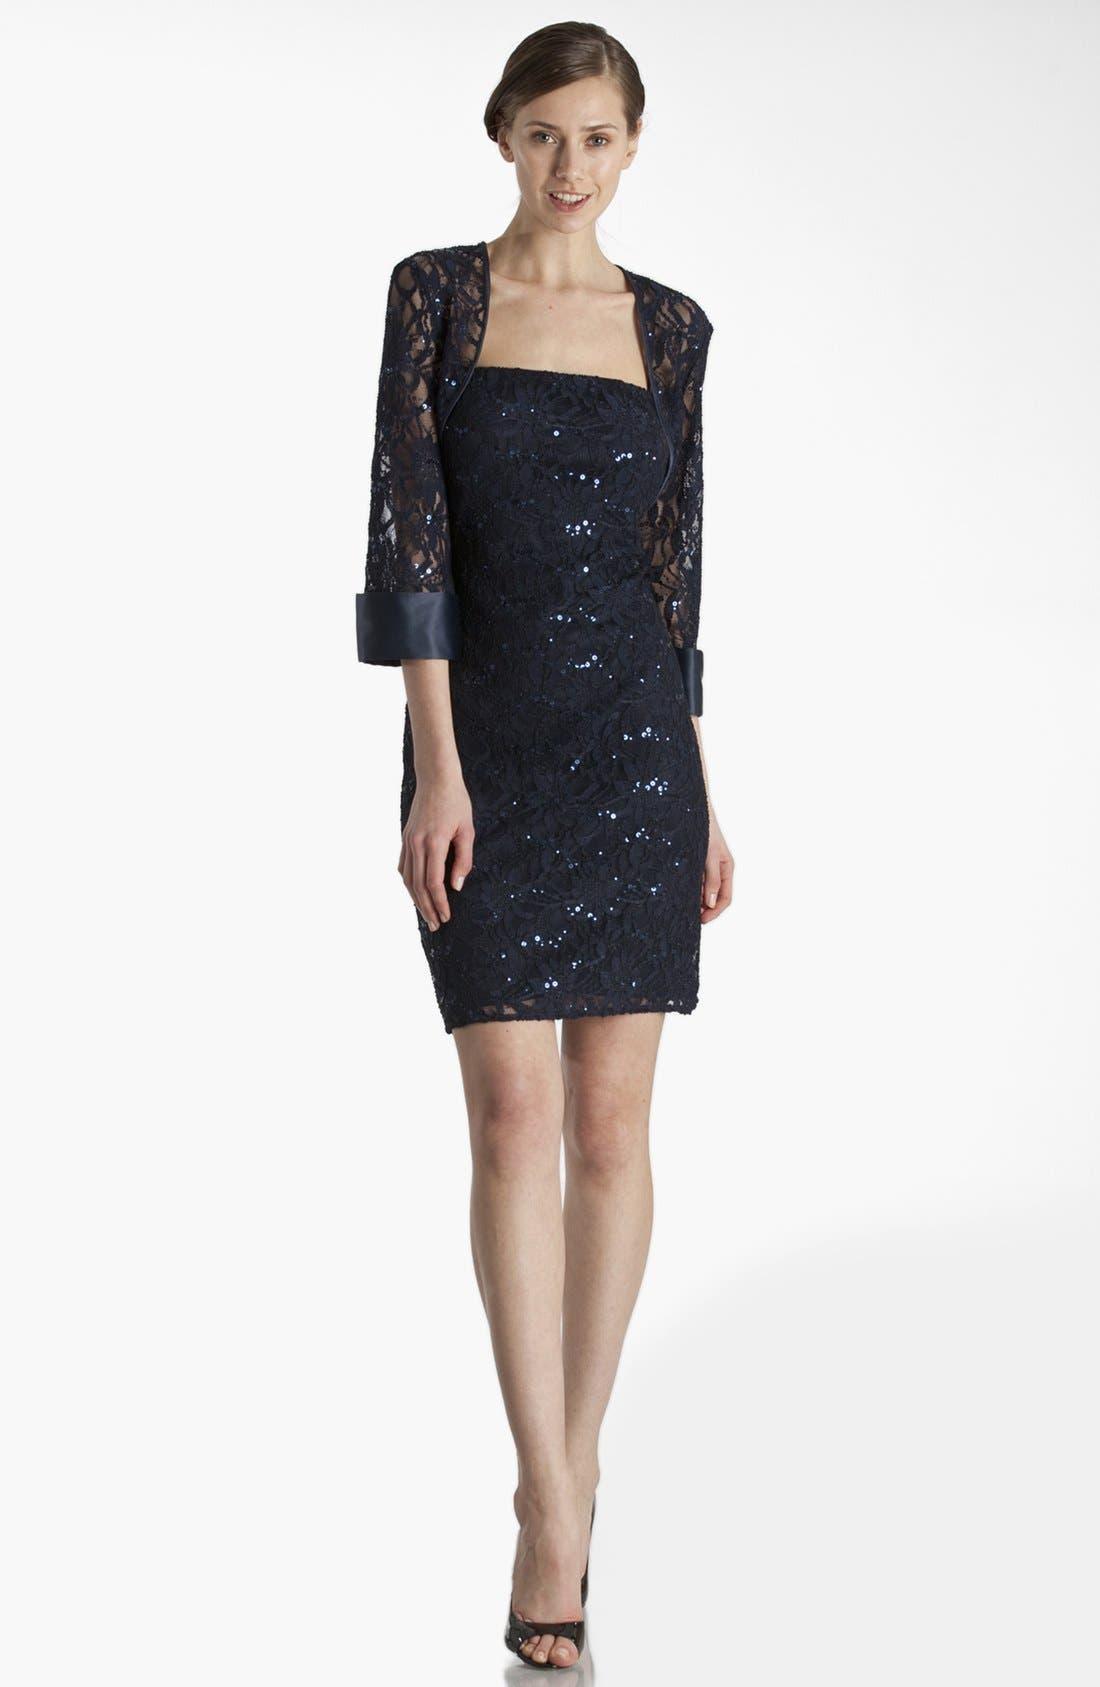 Alternate Image 1 Selected - JS Collections Embellished Lace Dress & Jacket